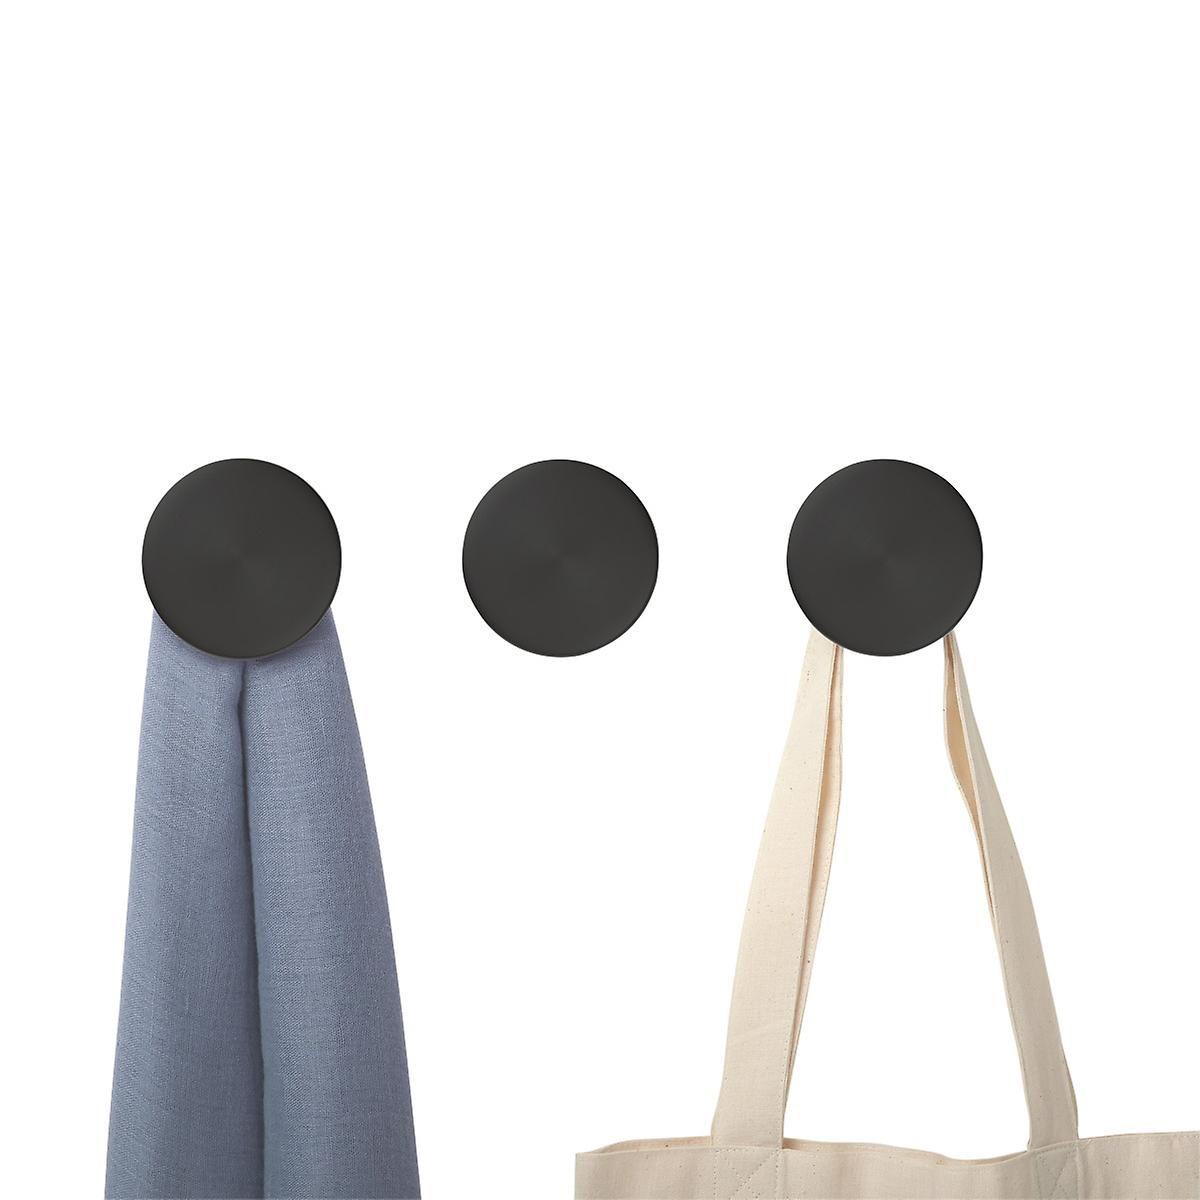 Wooden Wall Hooks Dot Charred Black Coat Hooks Set Of 3 Round